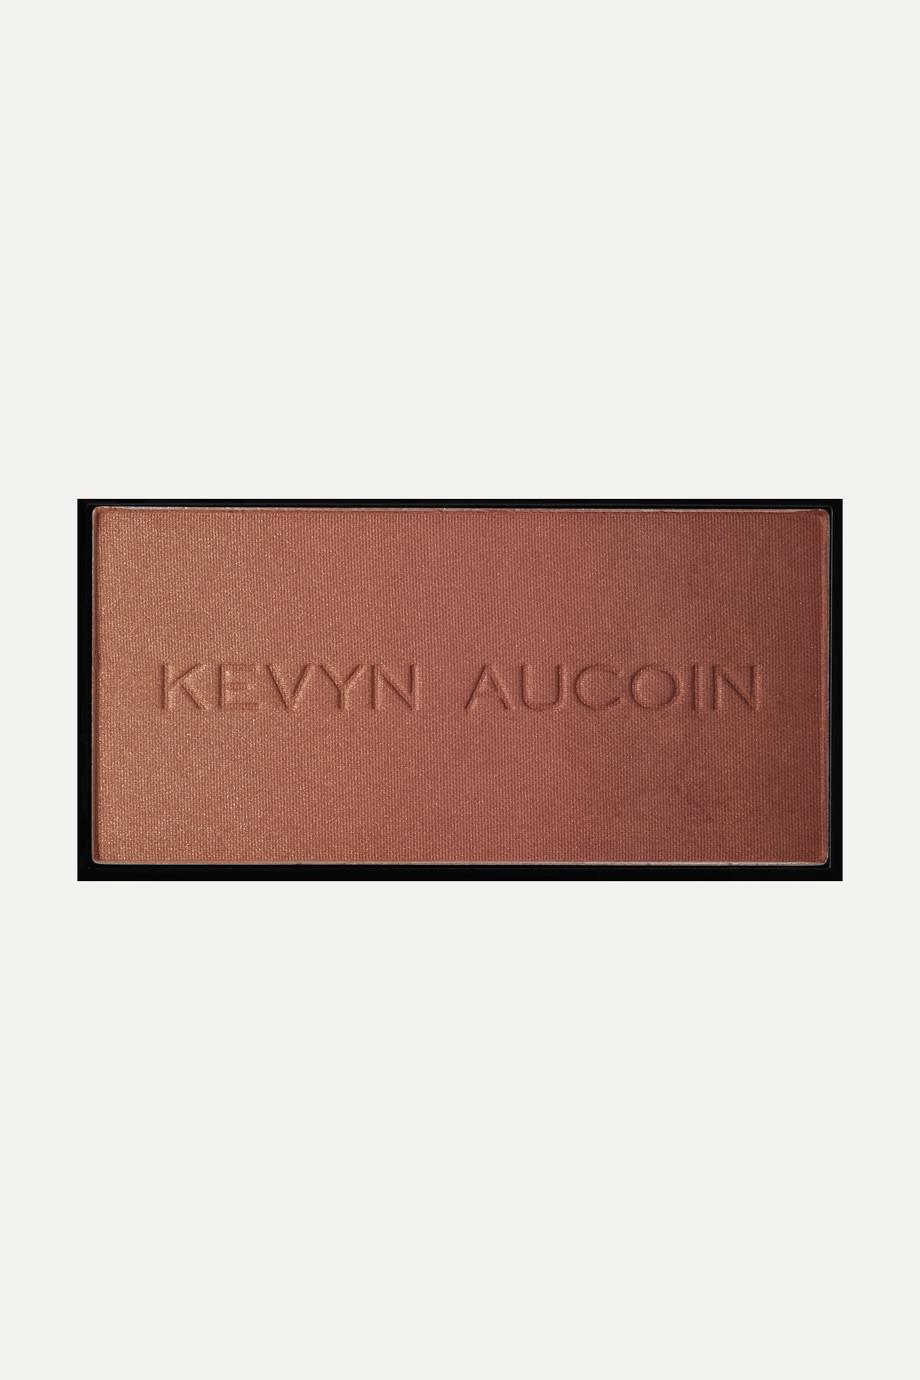 Kevyn Aucoin Poudre bronzante The Neo, Sundown